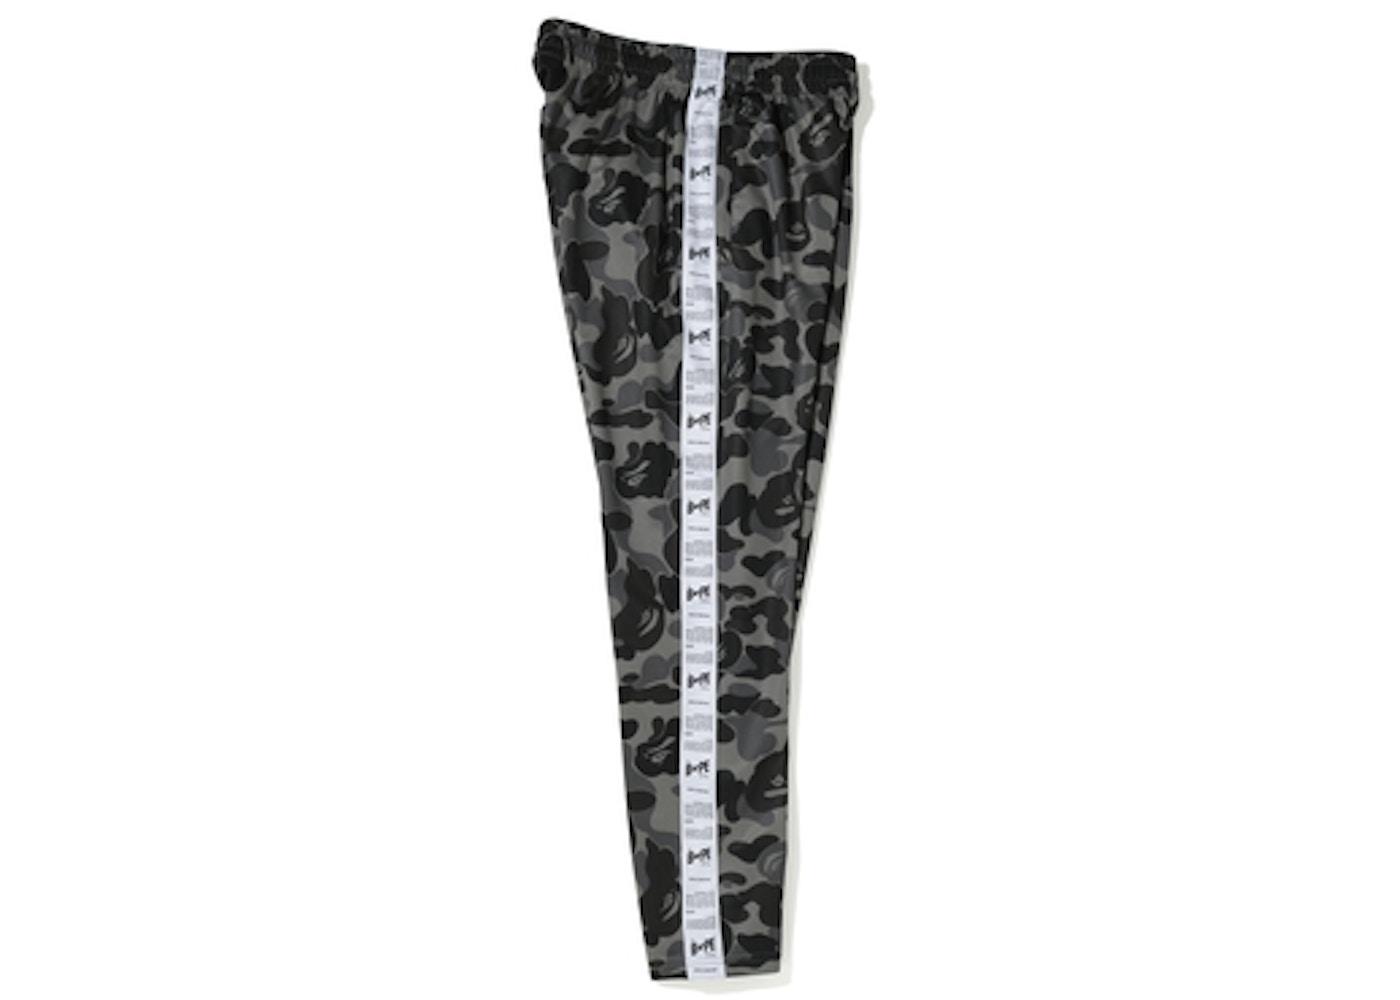 807af37d Bape Bottoms - Buy & Sell Streetwear